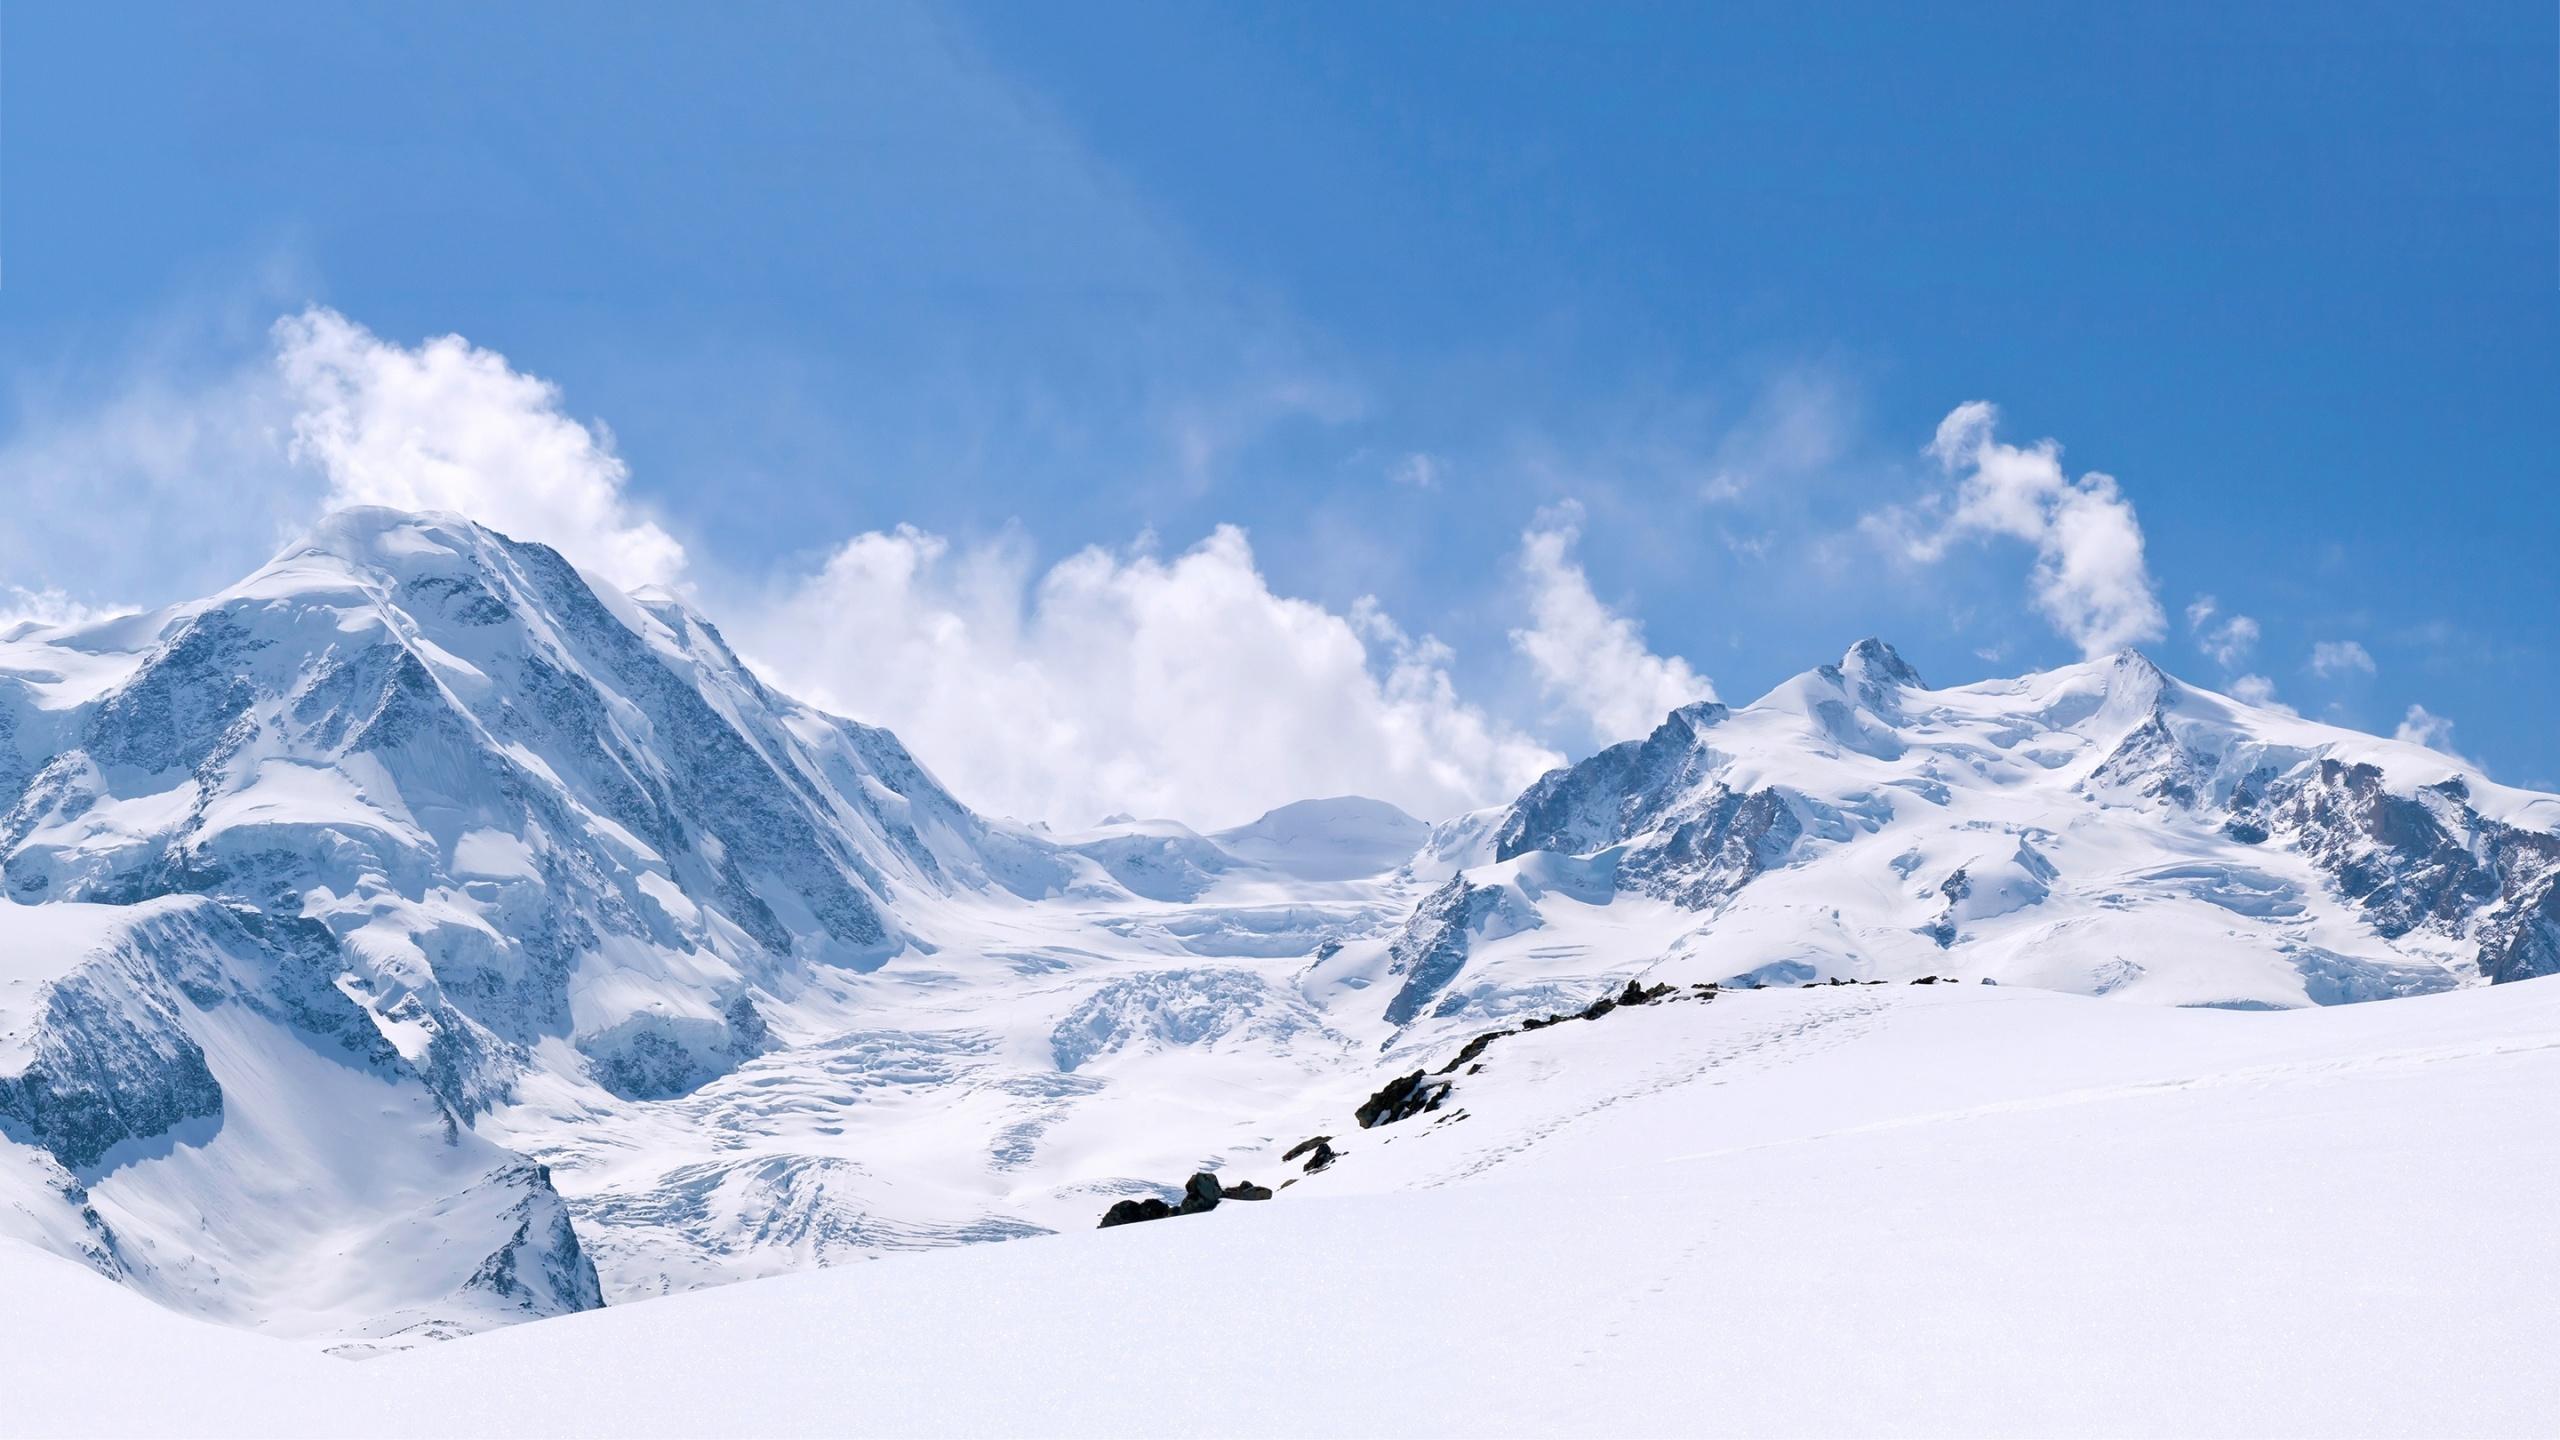 Winter Mountain Wallpaper